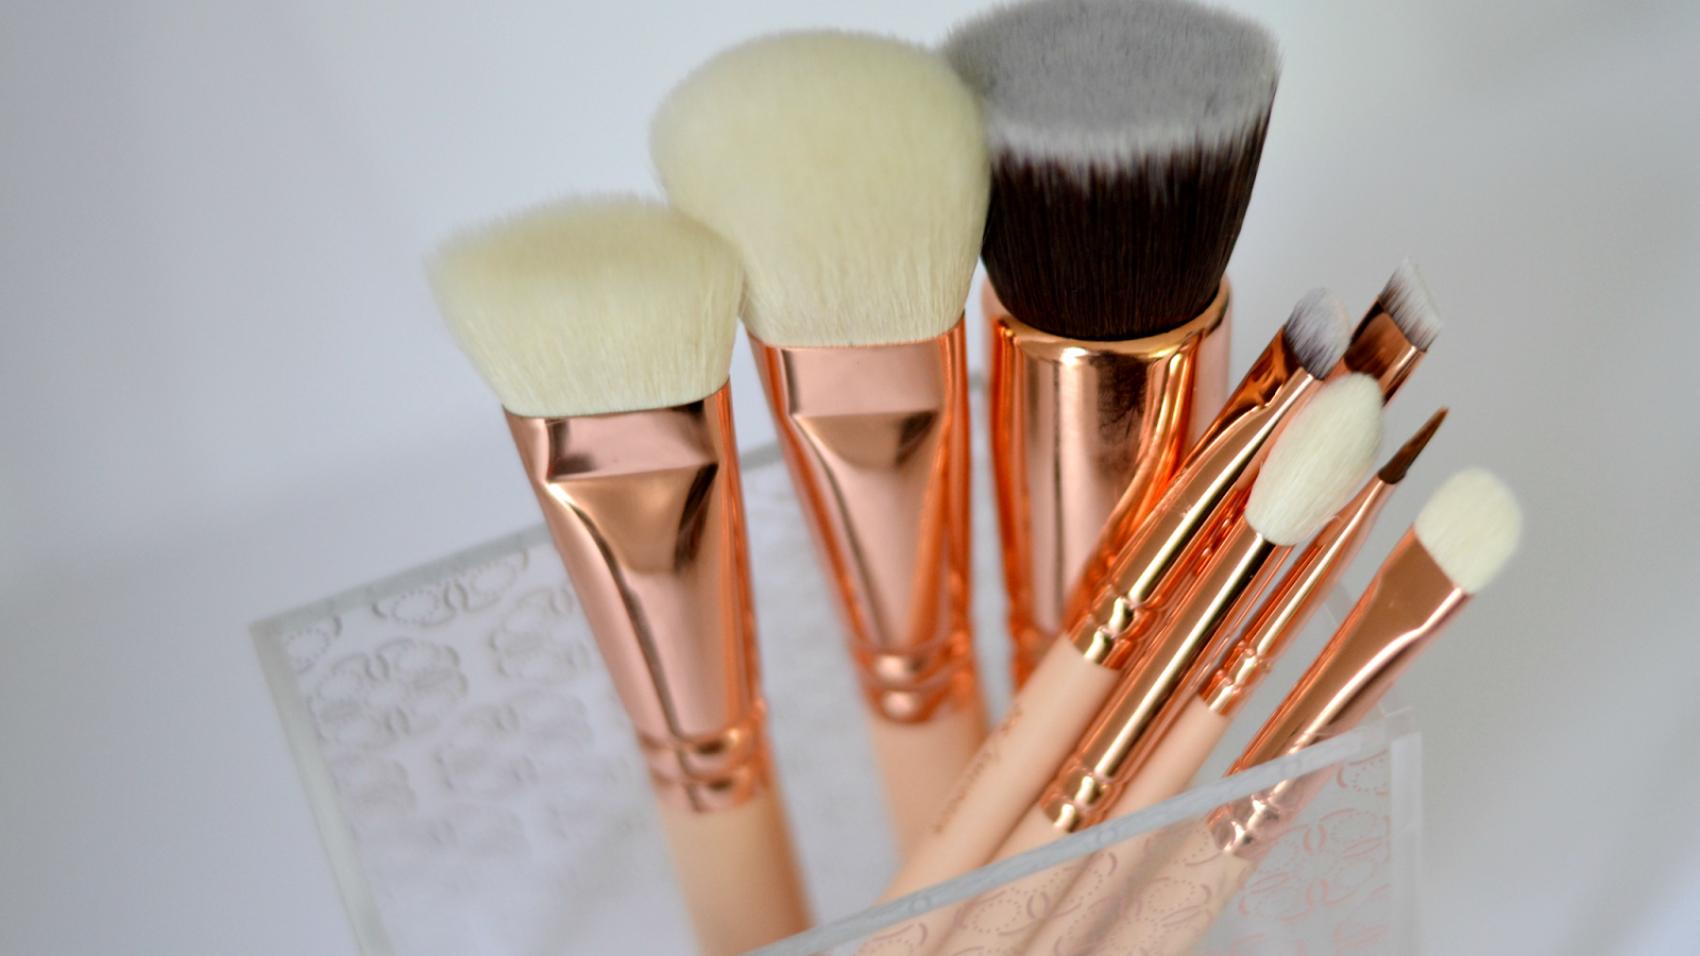 zoeva rose gold makeup brushes 1